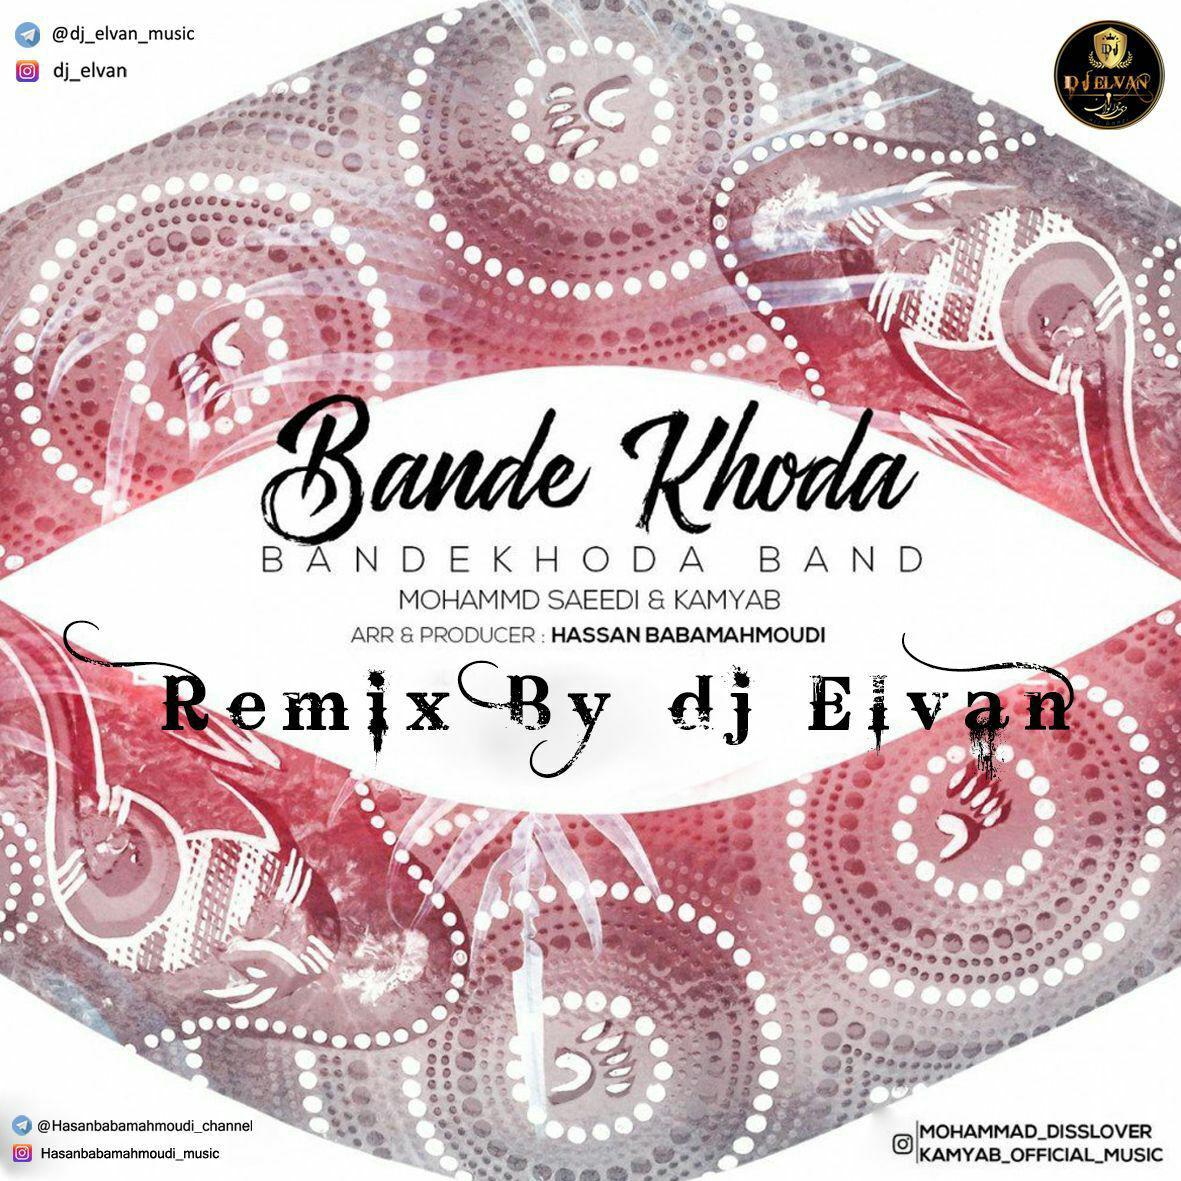 Bandekhoda Band - Baande Khoda (Dj Elvan Remix)